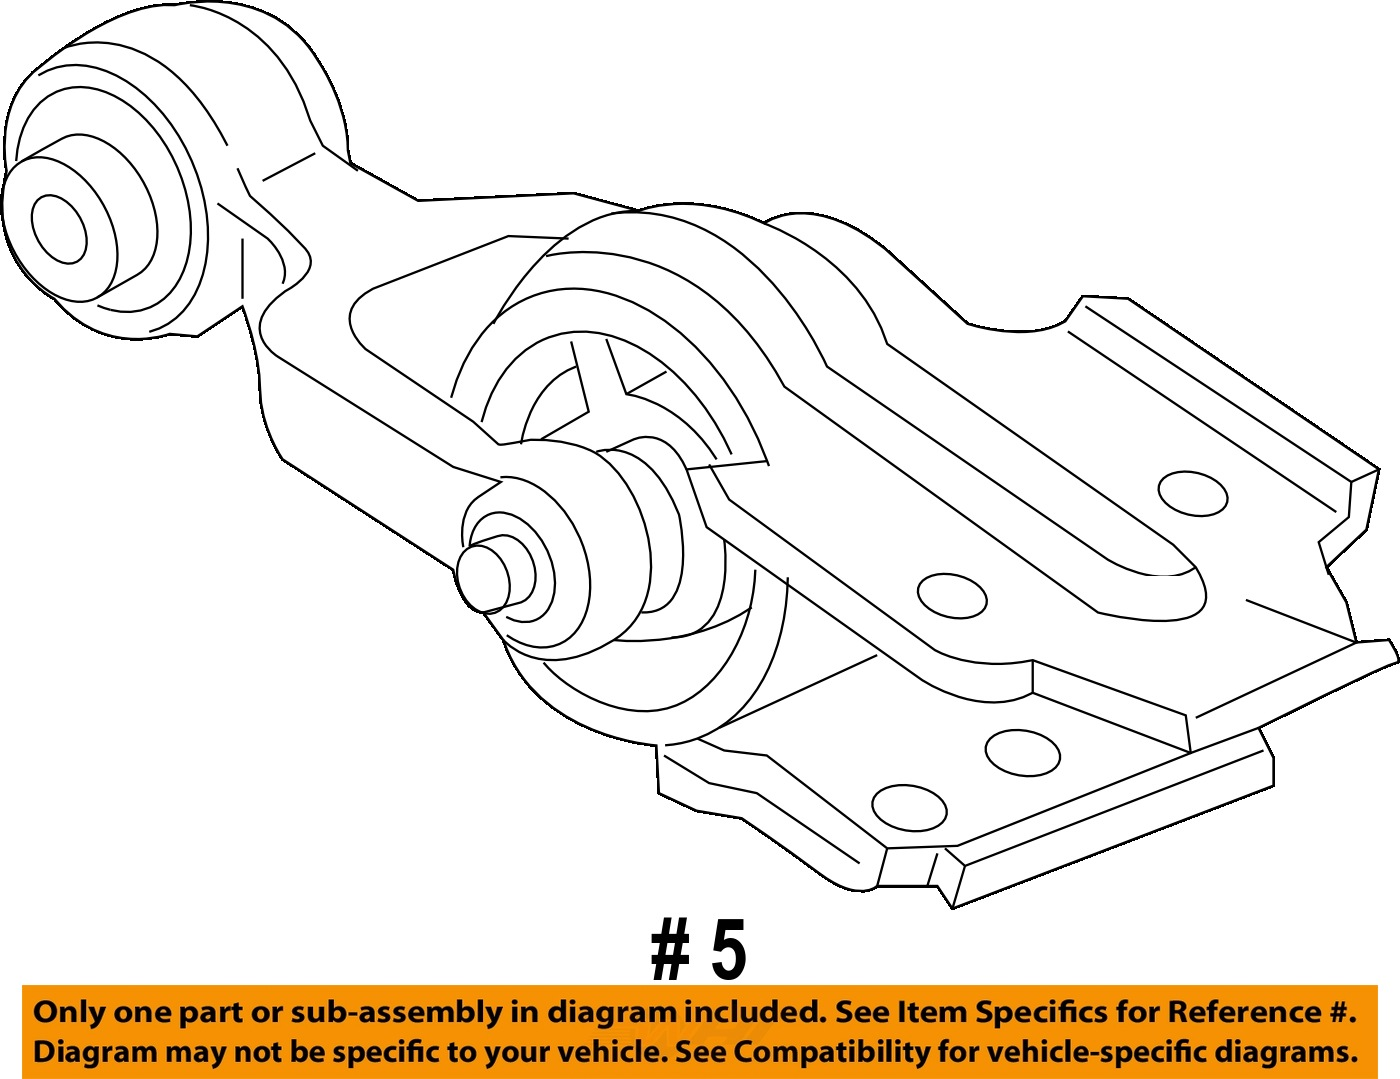 Chevy impala 3 6 upper dogbone motor mount